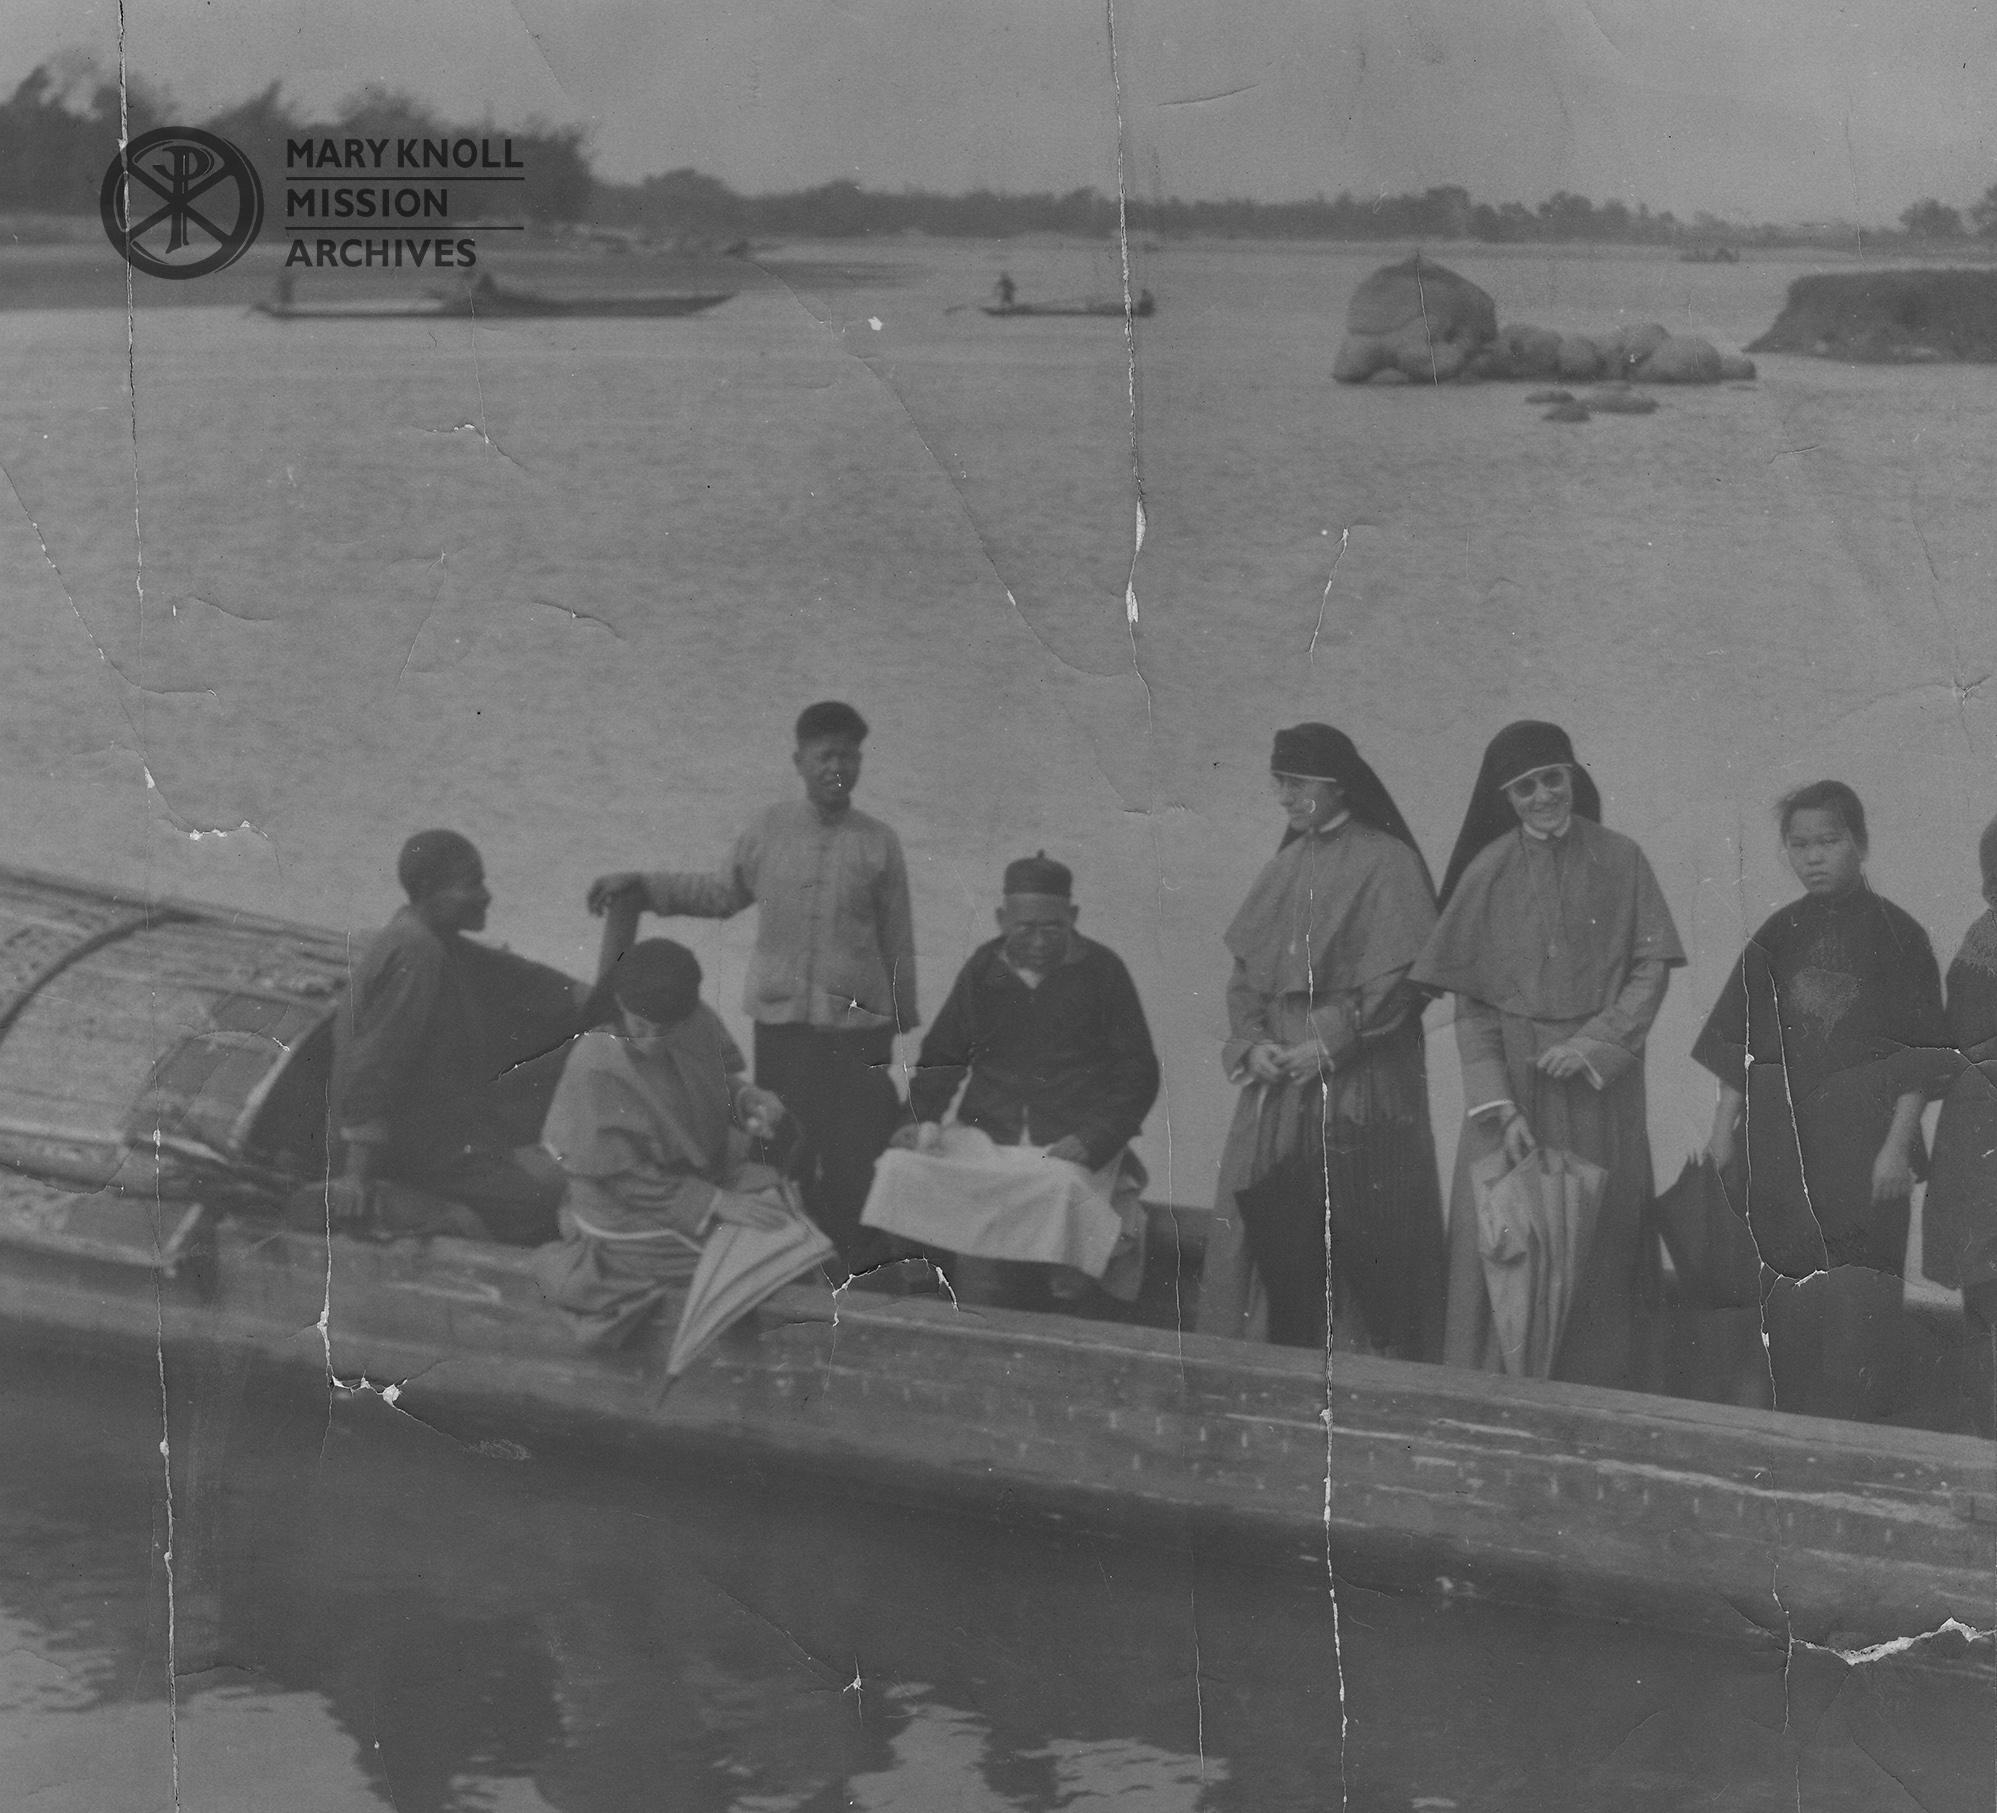 Sister Rose Leifels and Sister Magdelen Doelger on a boat in Luoding, 1925